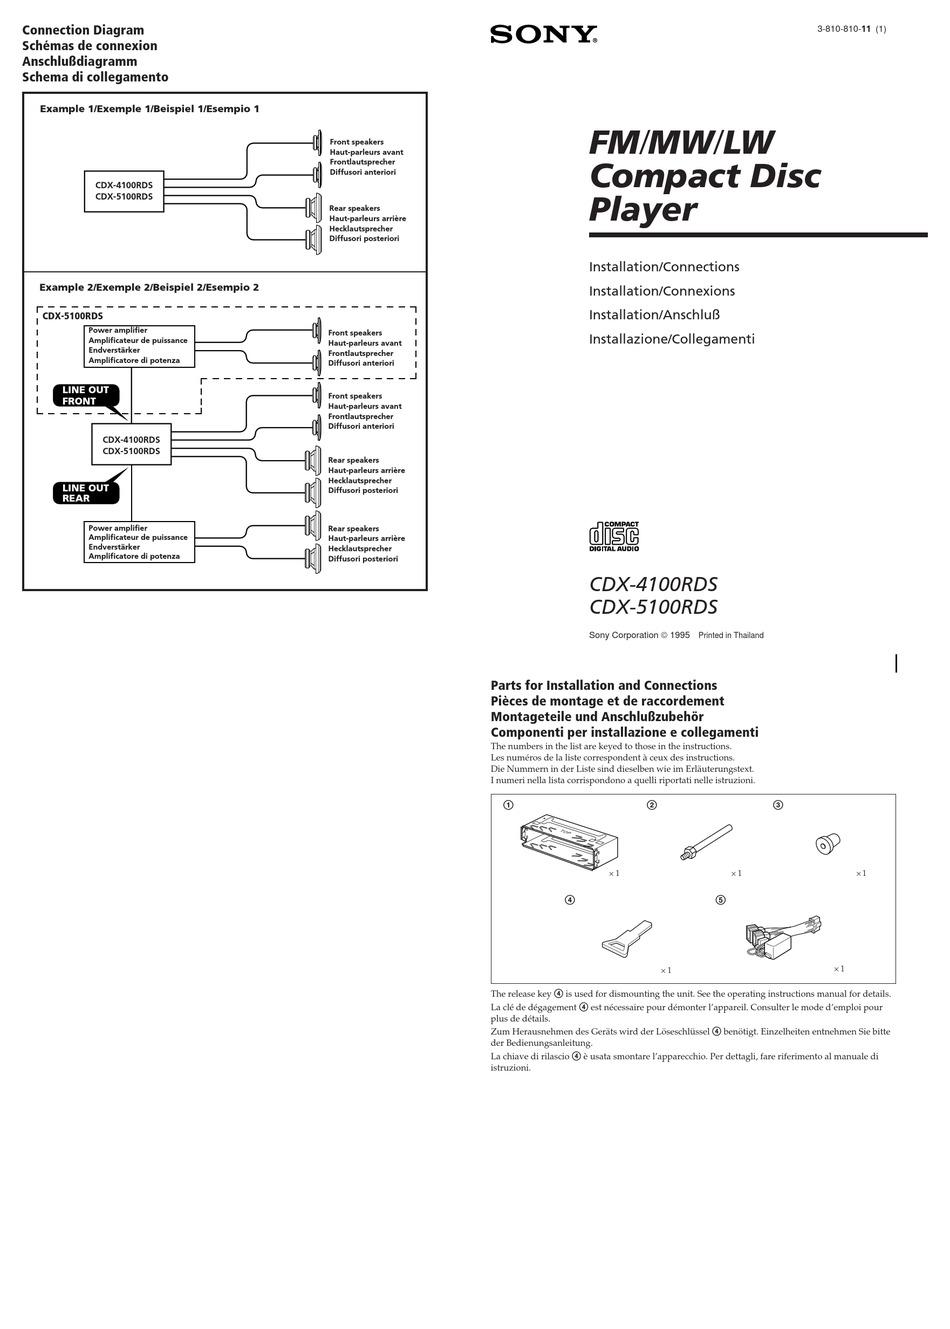 Sony Cdx 4100rds Installation